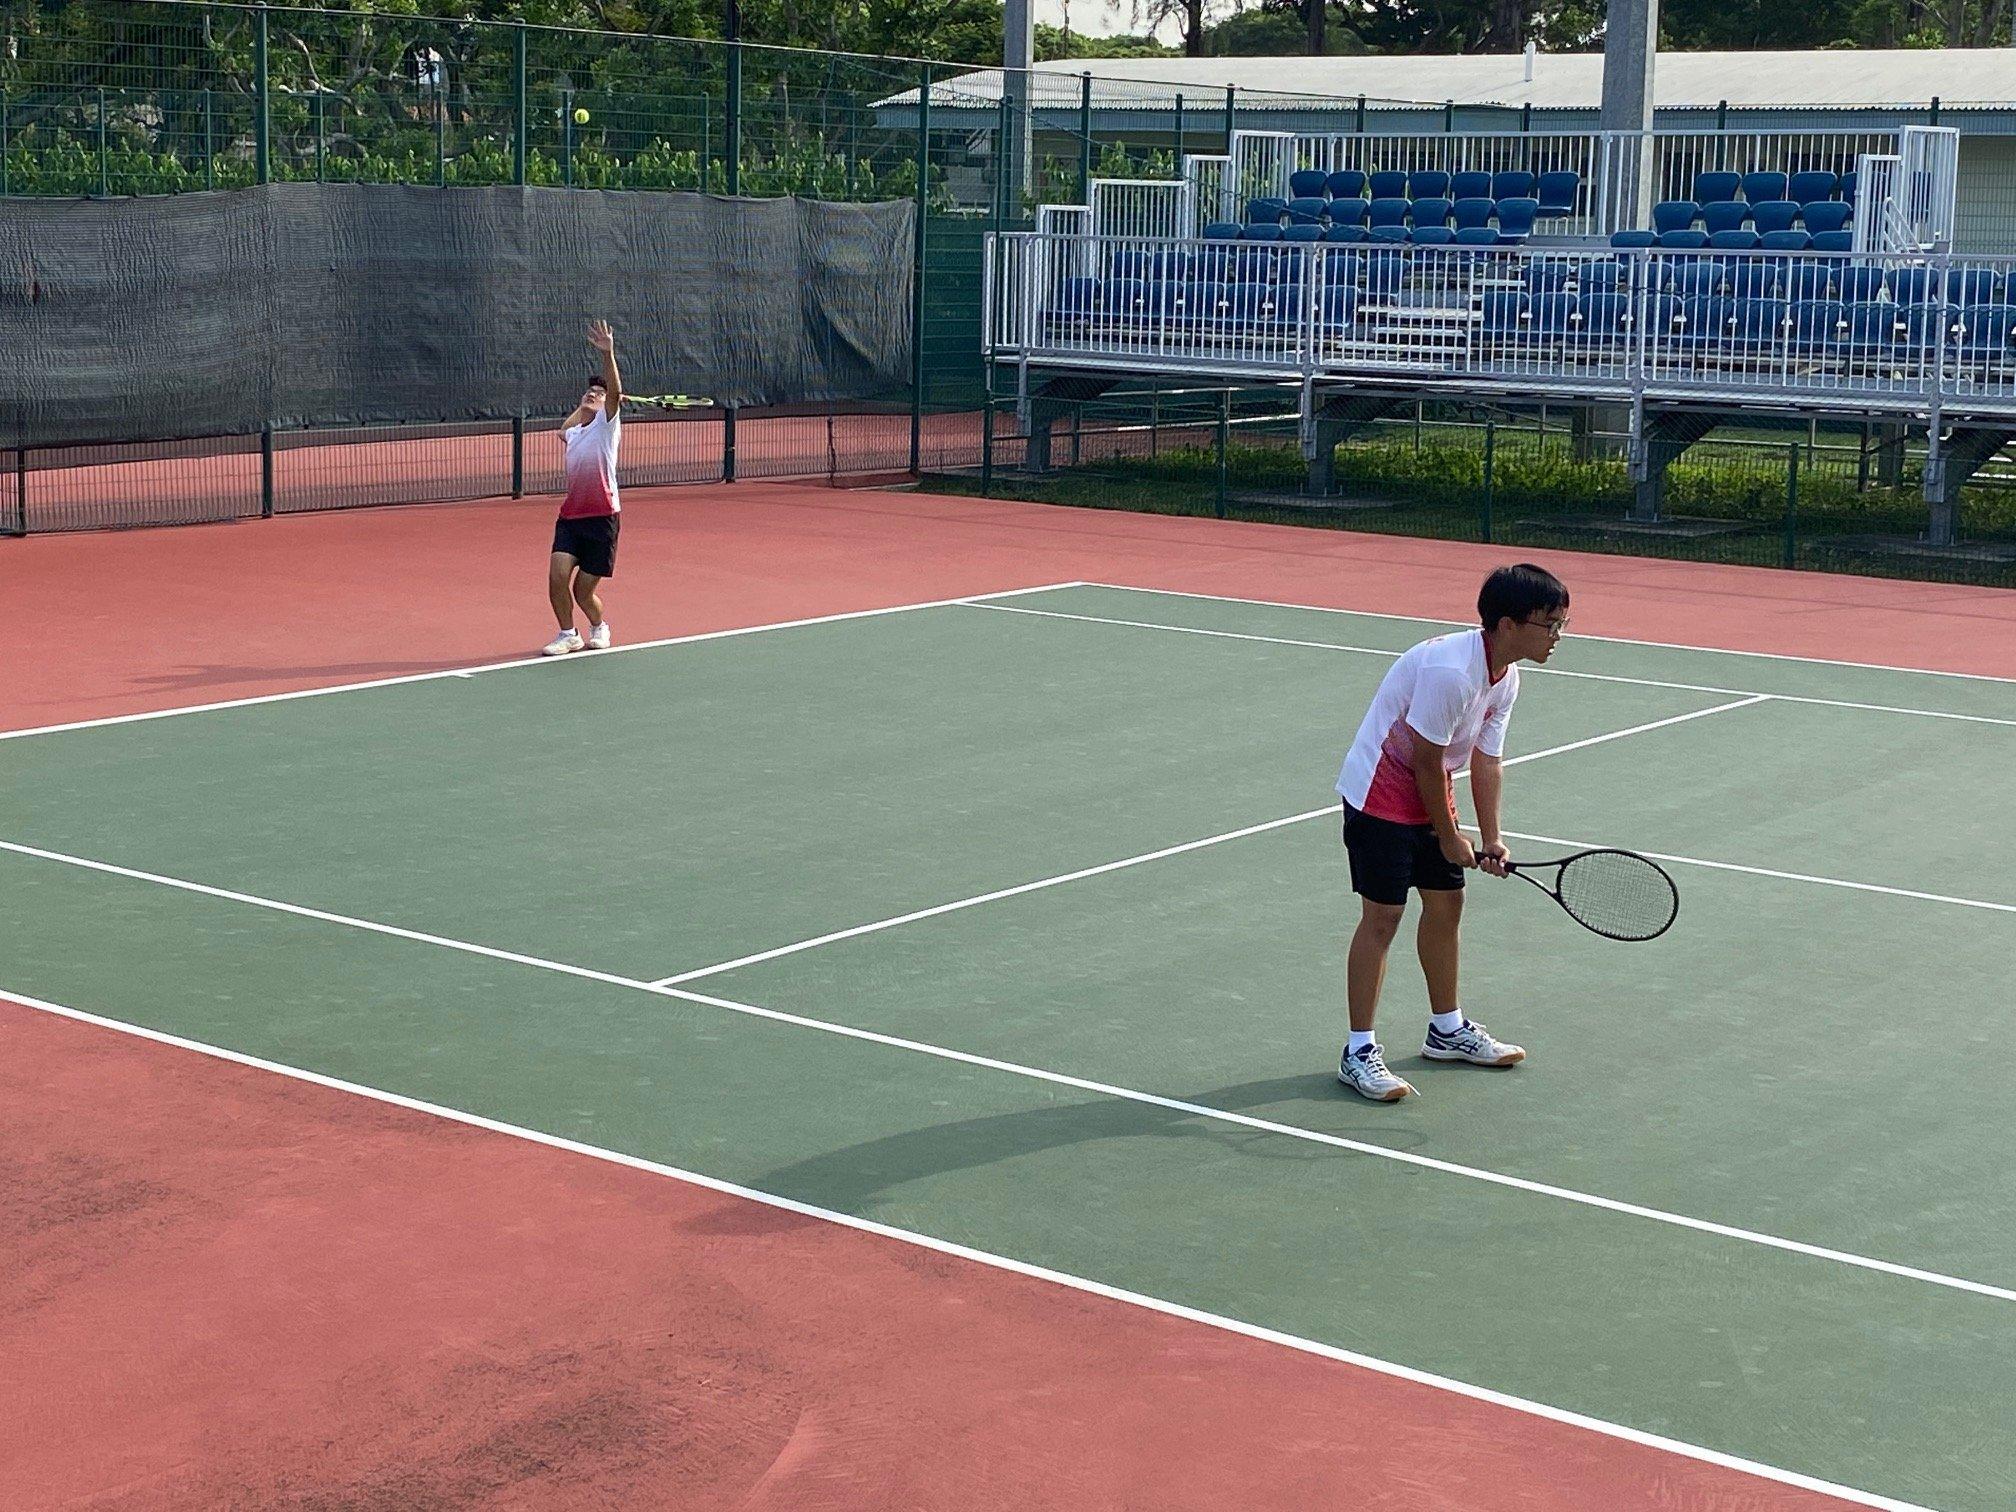 NSG B Div boys tennis - Victoria Schools doubles pair Matthew William Tan and Joshua Chan in action at Kallang Tennis Centre